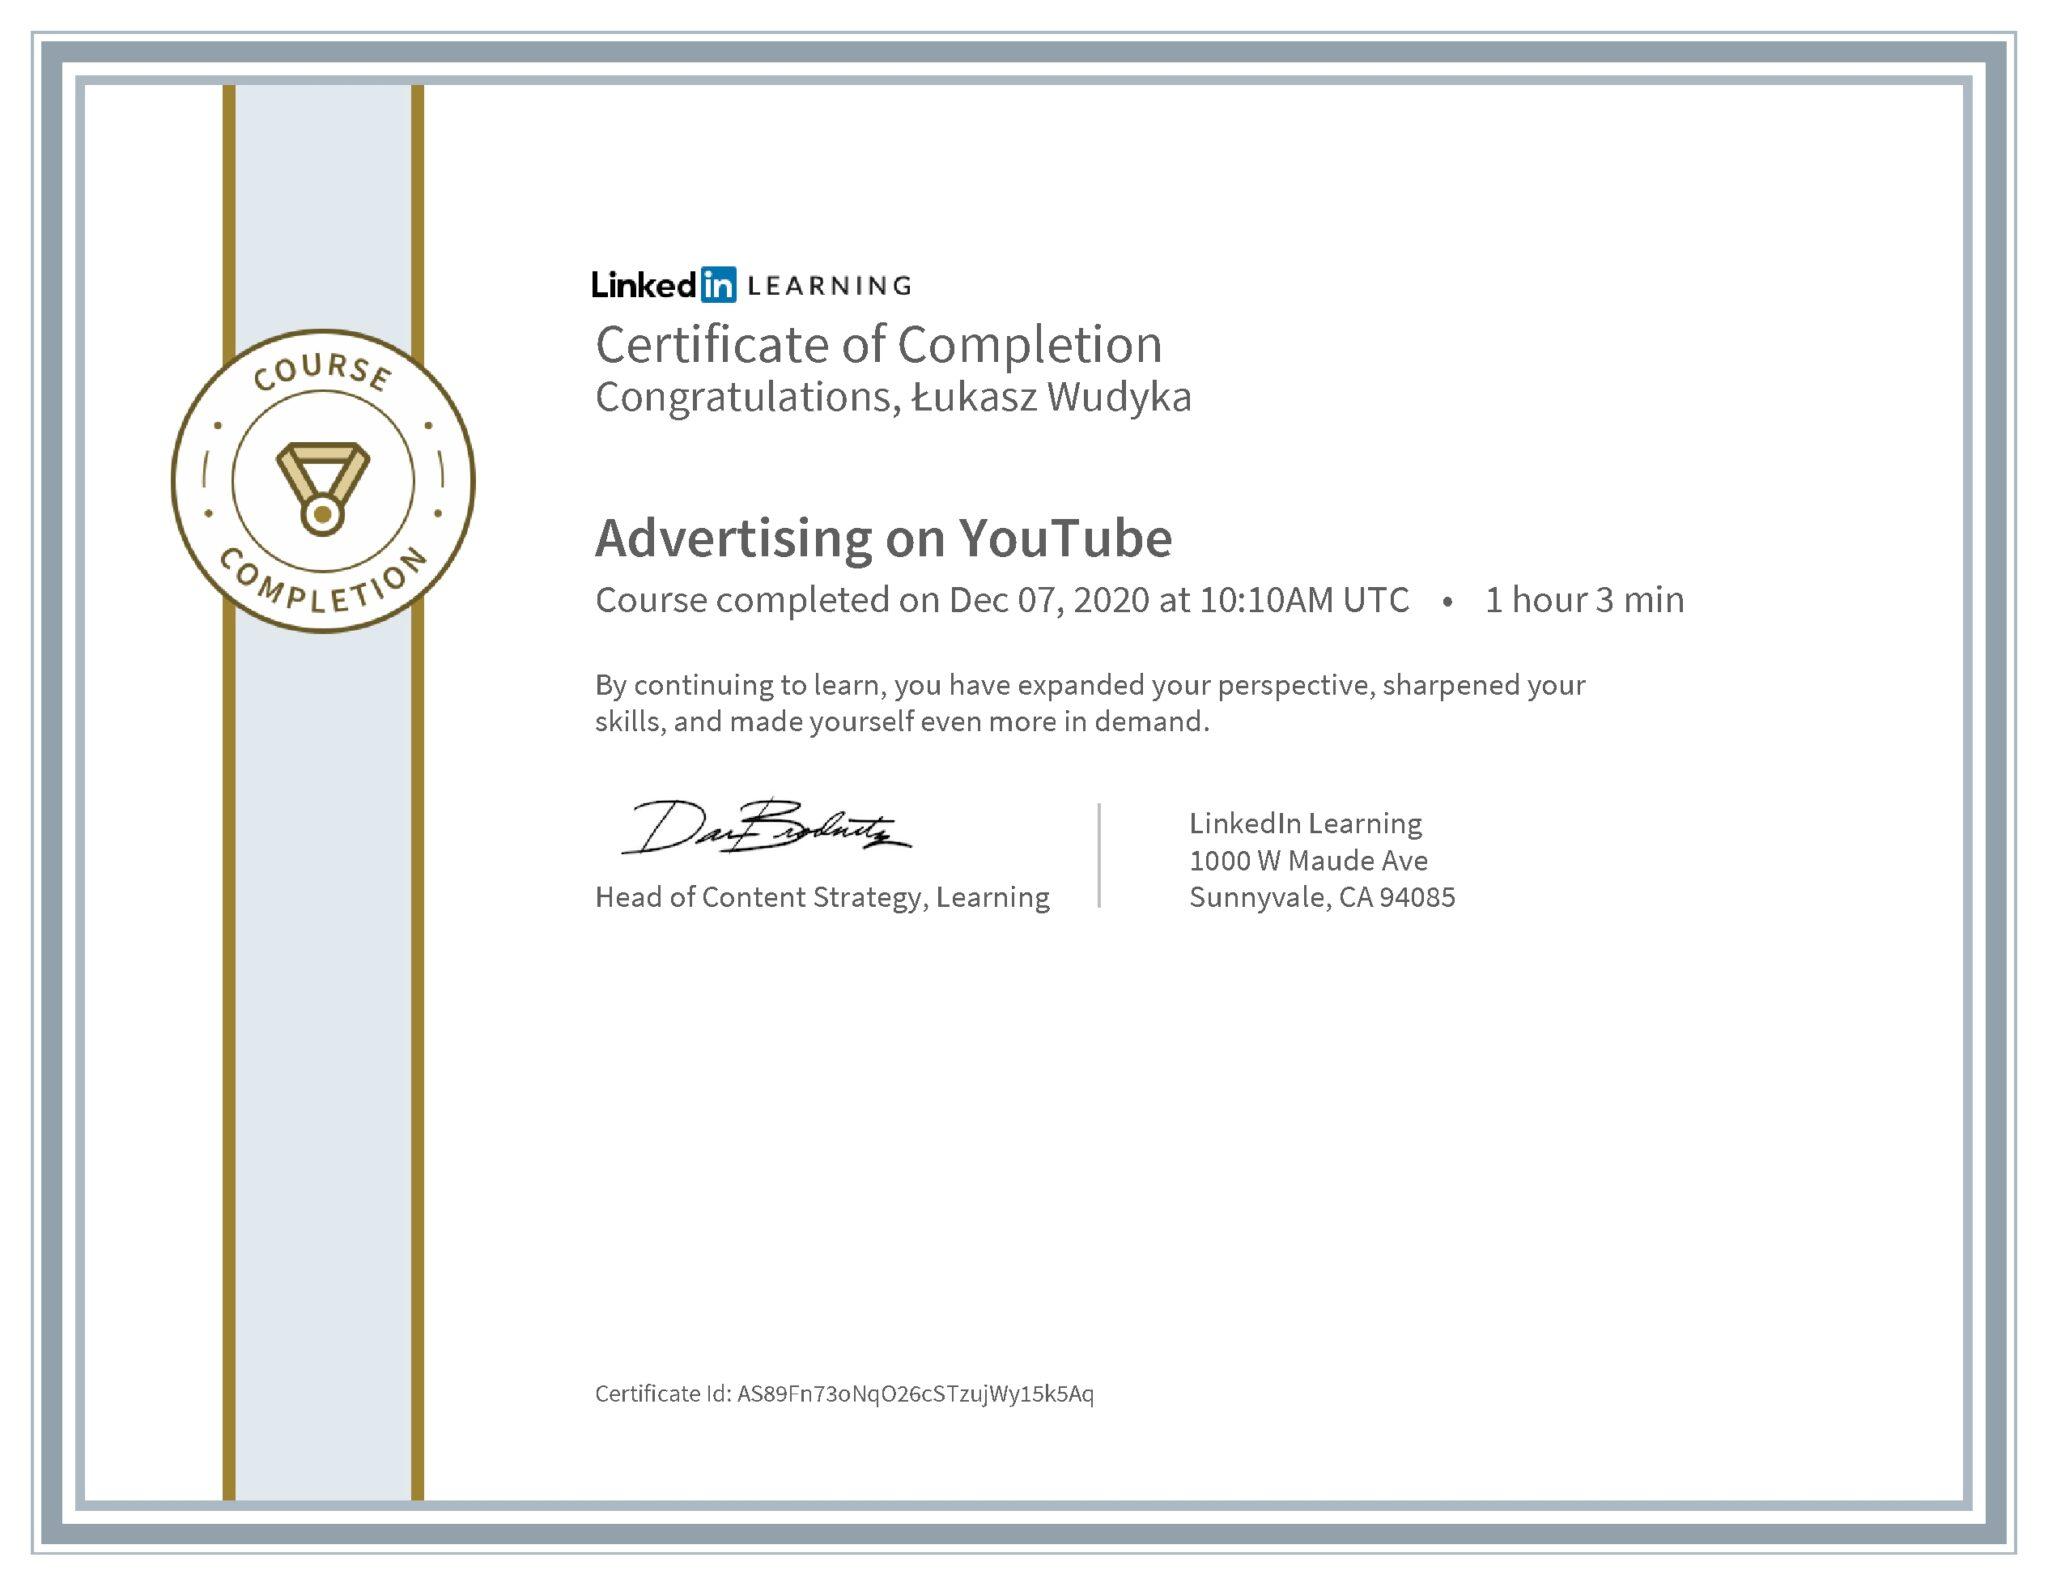 Łukasz Wudyka certyfikat LinkedIn Advertising on YouTube